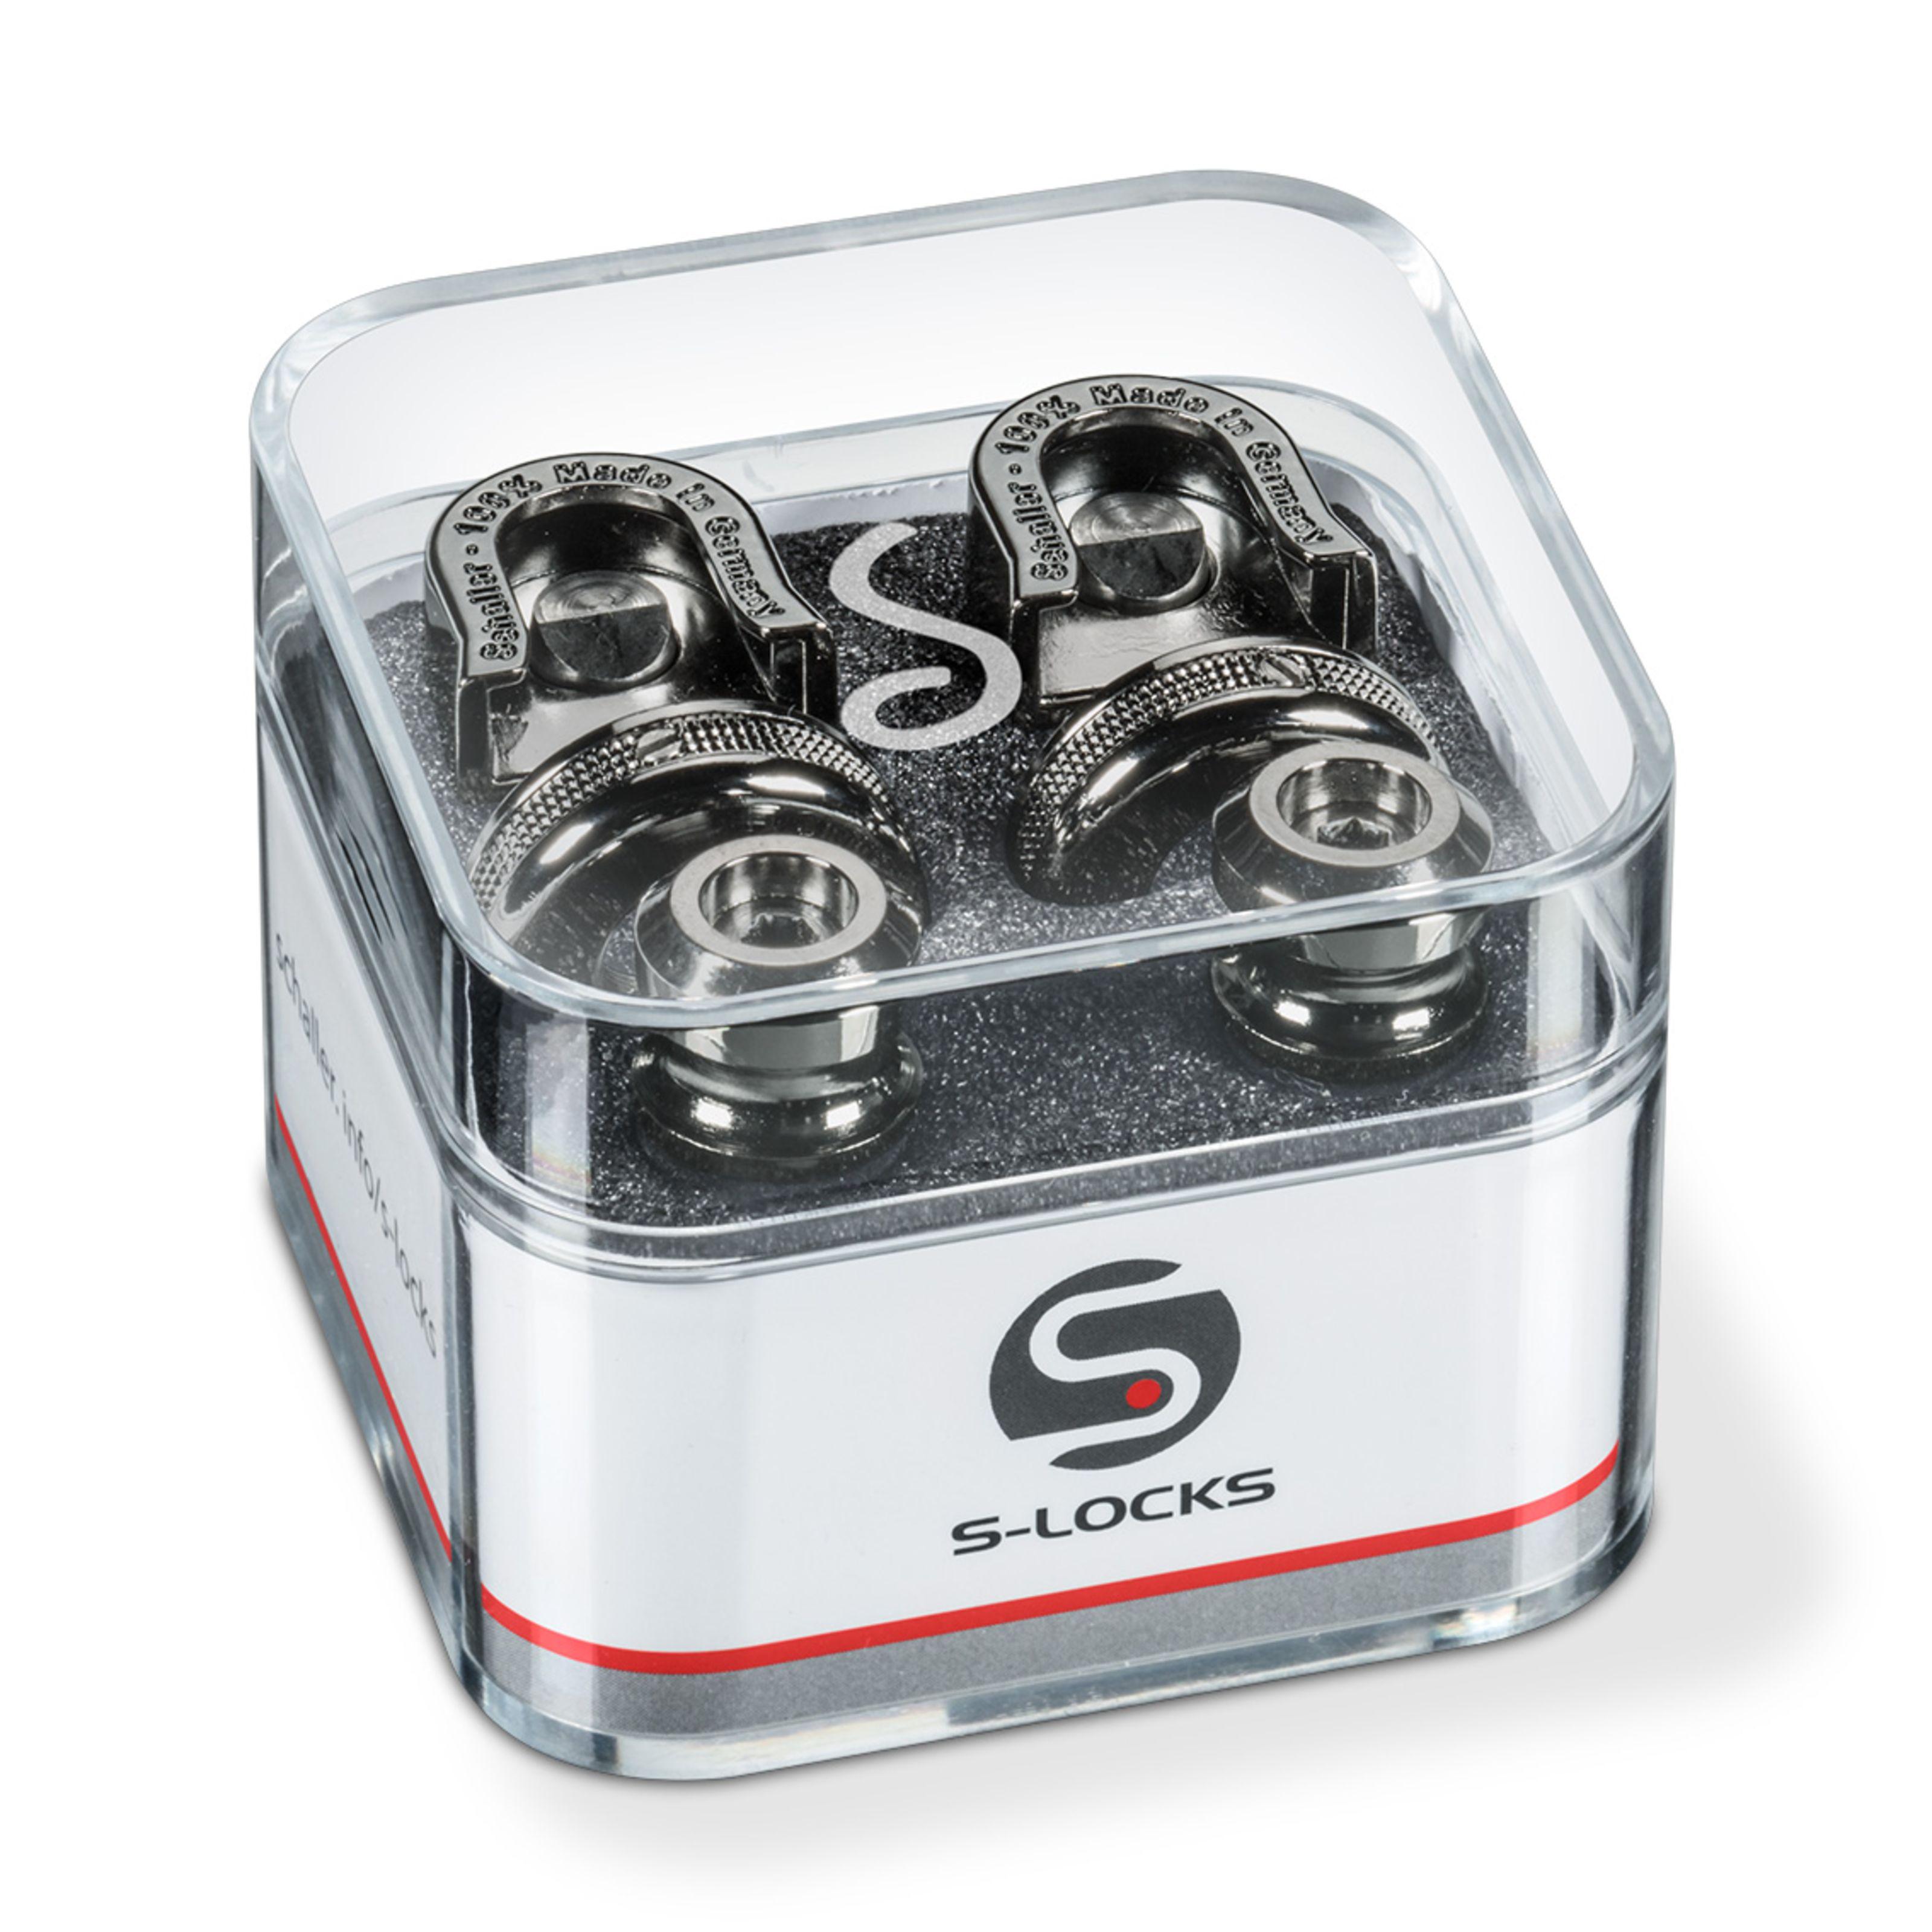 Schaller - S-Locks Ruthenium 740006